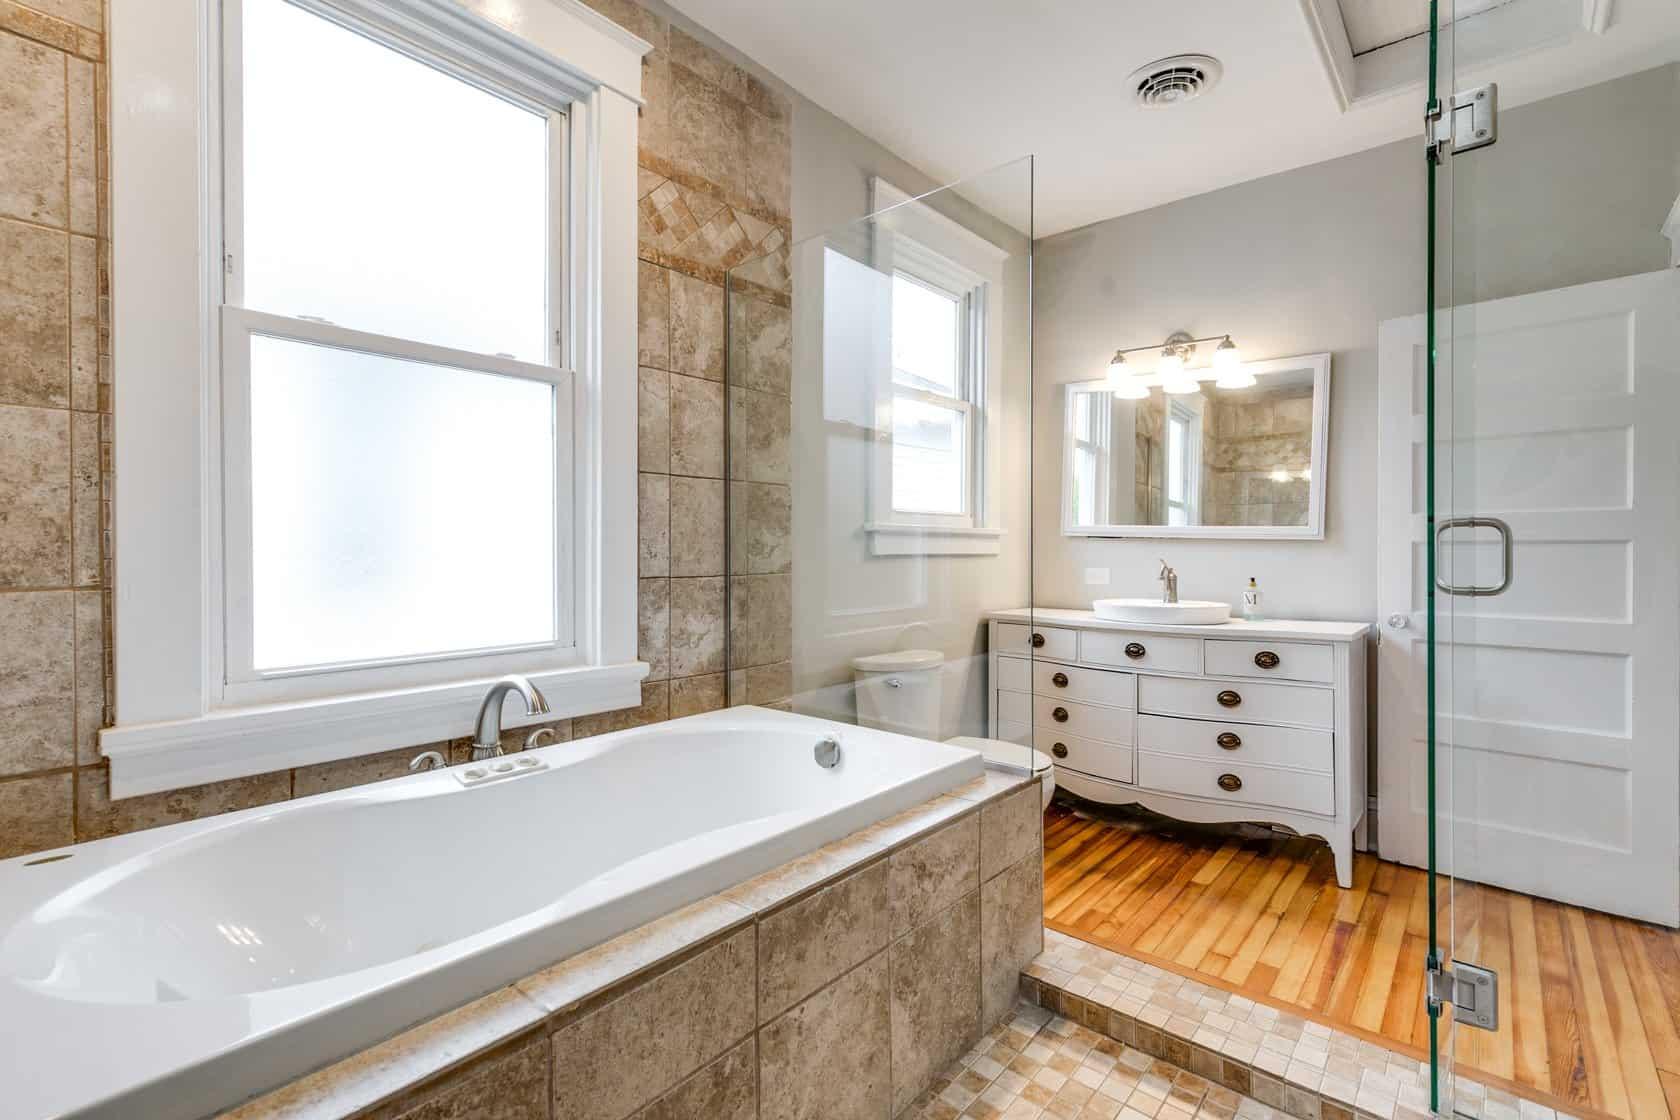 barton ave richmond bathroom remodel virginia shower door llc rh vashowerdoor com bathroom remodel northern virginia bathroom remodel alexandria virginia